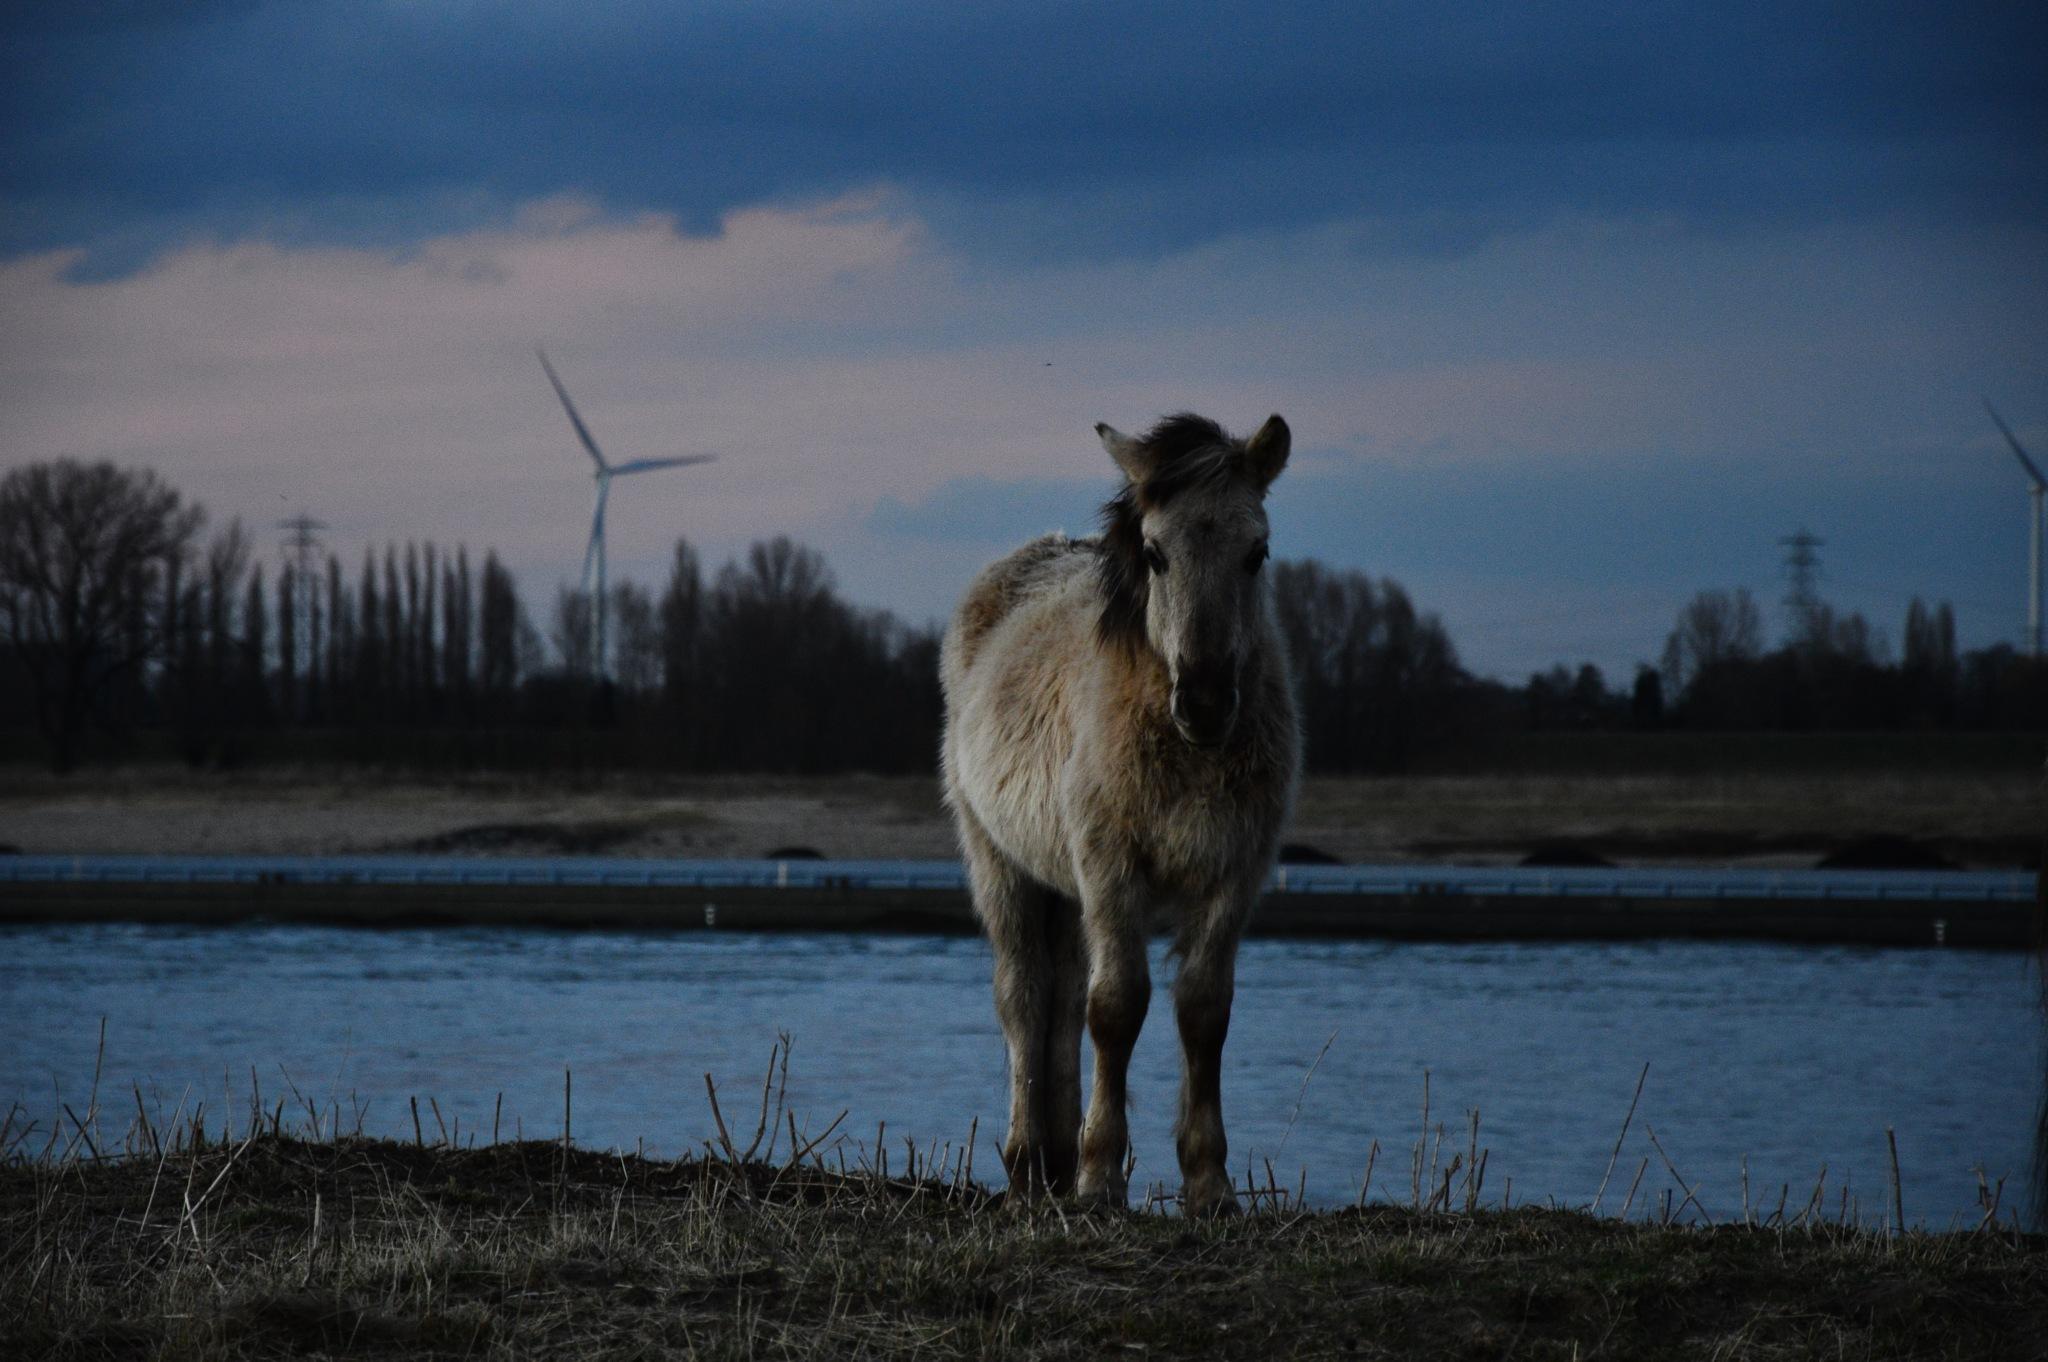 Wild horse by Roanne Frerejean